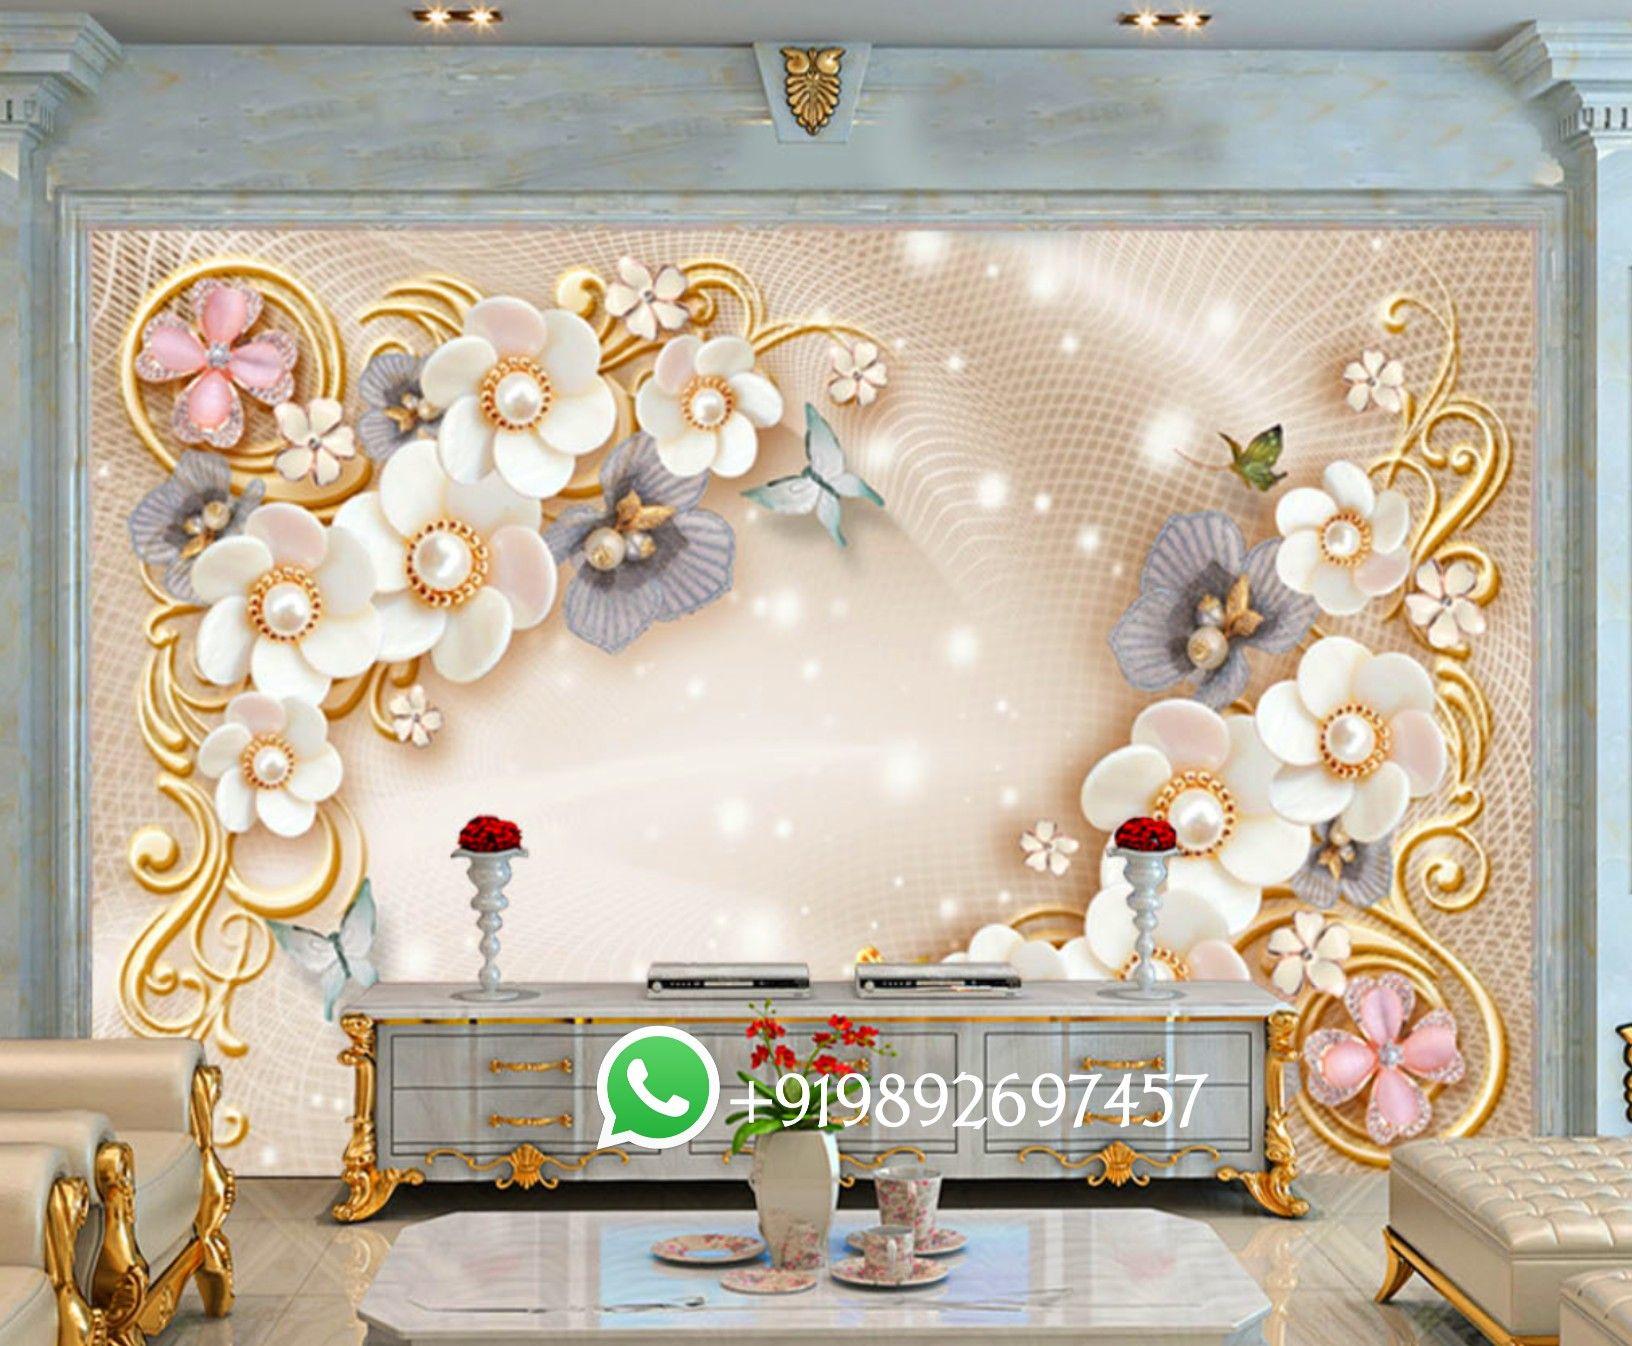 Lovely Wallpaper For Tv Unit Wall 5d 5d Wallpaper For Living Room Tv Unit Area 5d Beautiful 3d Wallpaper Decor Wallpaper Living Room Wallpaper Decor